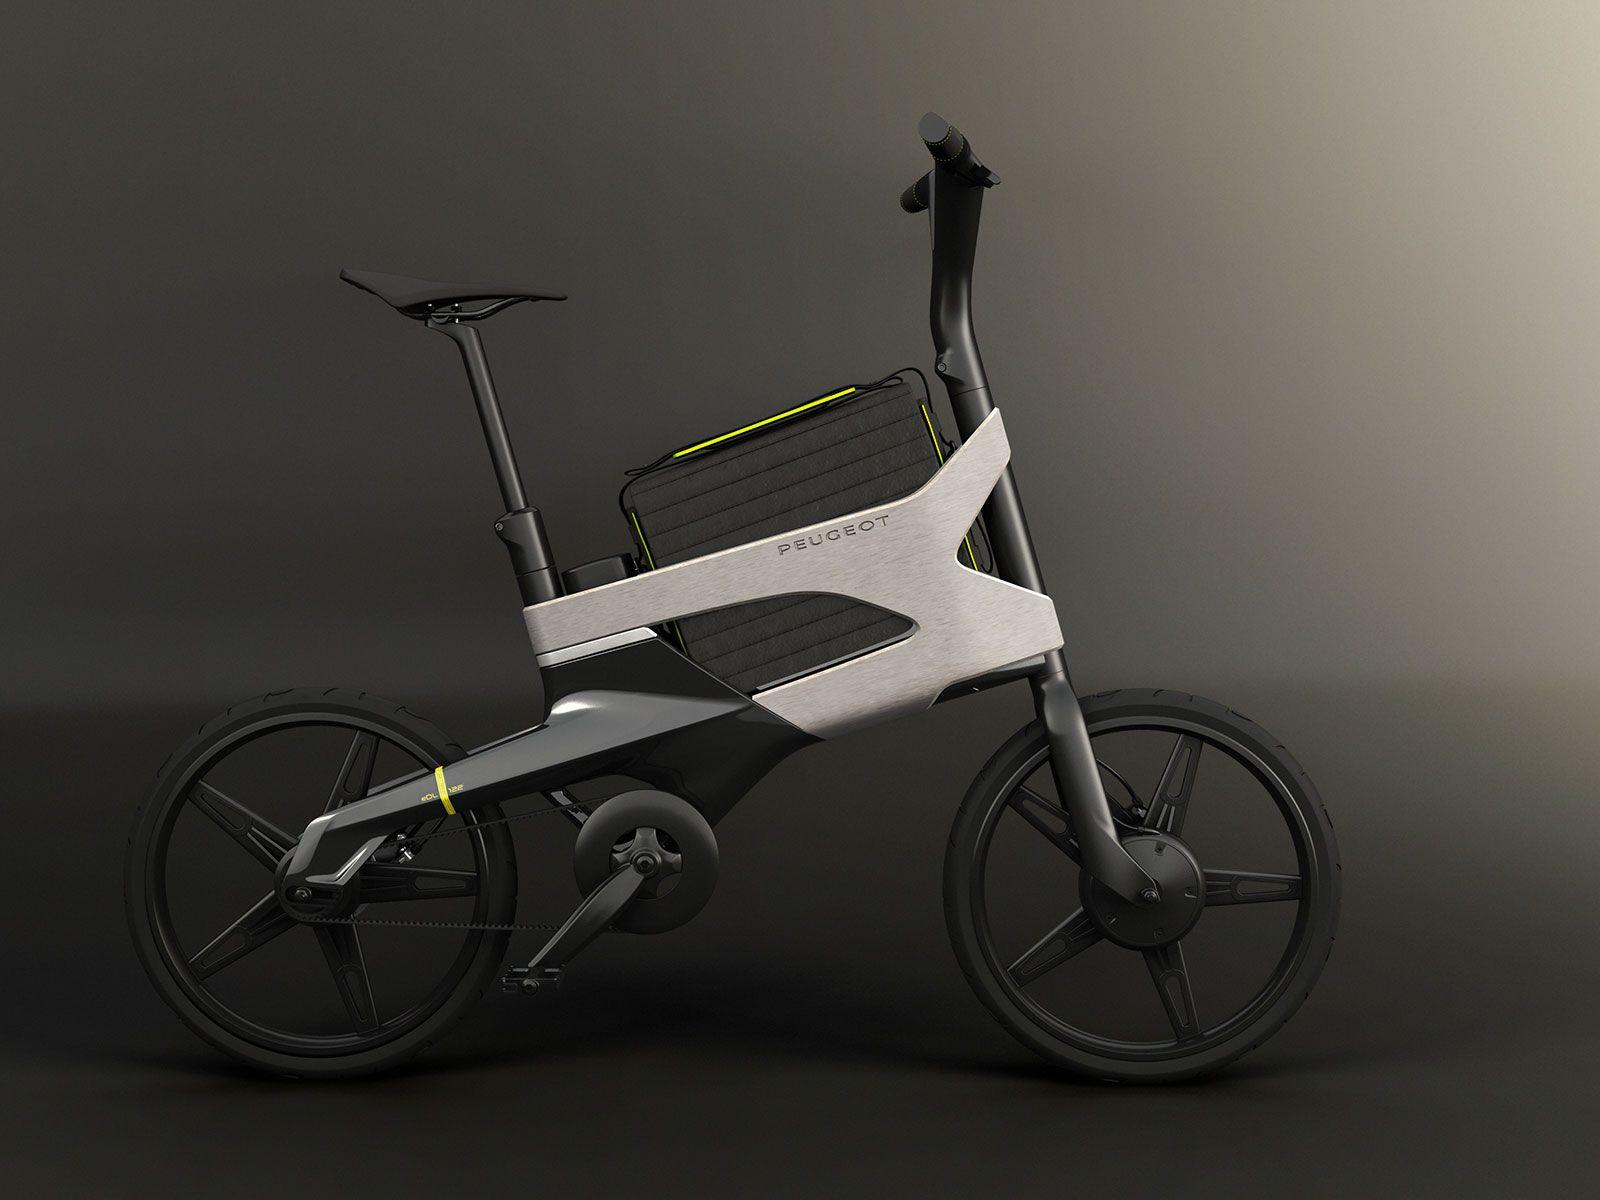 Peugeot Concept Bike Edl122 Velosiped Avtomobili Samokat